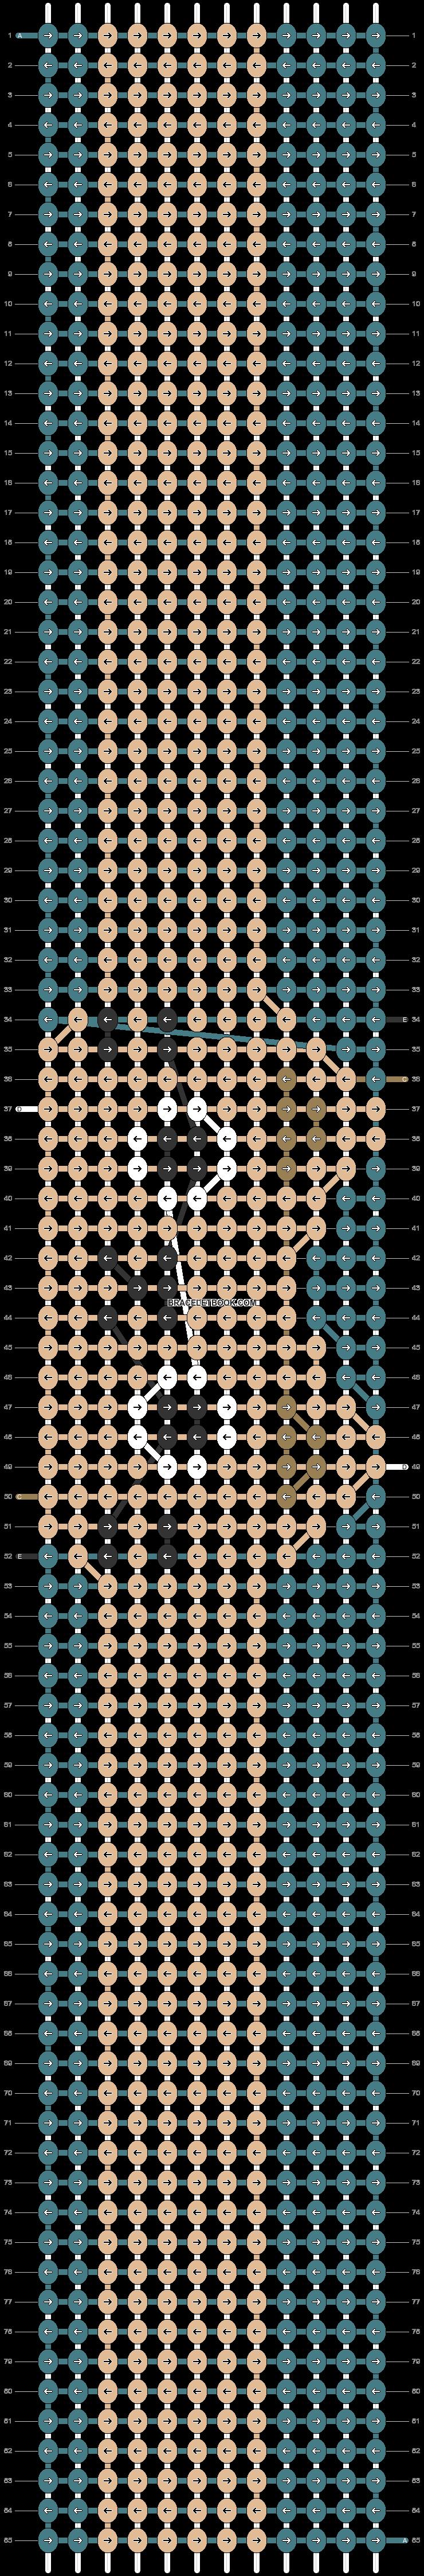 Alpha pattern #89842 variation #162270 pattern